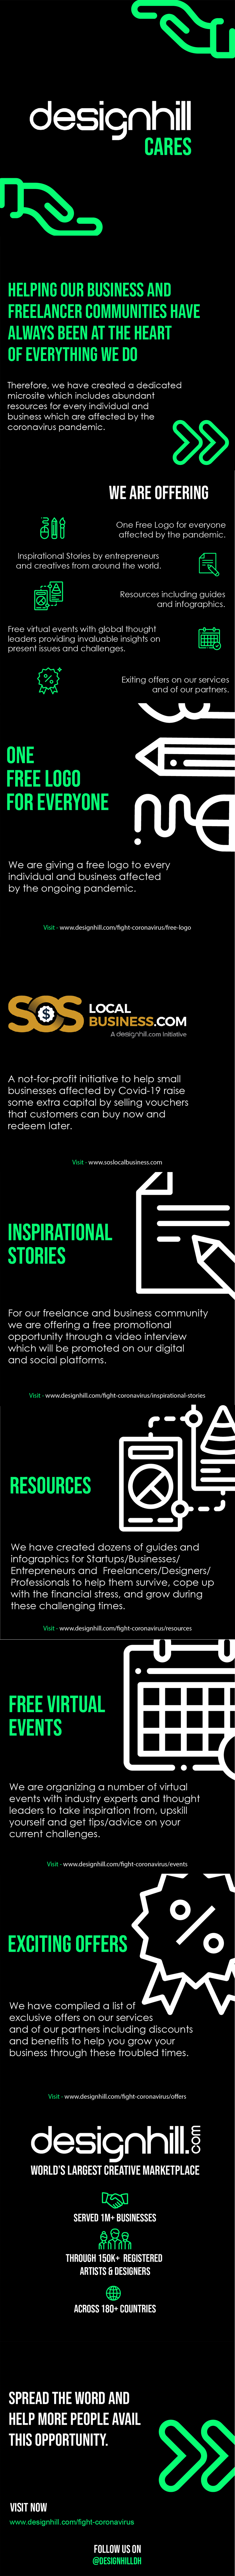 Designhill Offering Resources